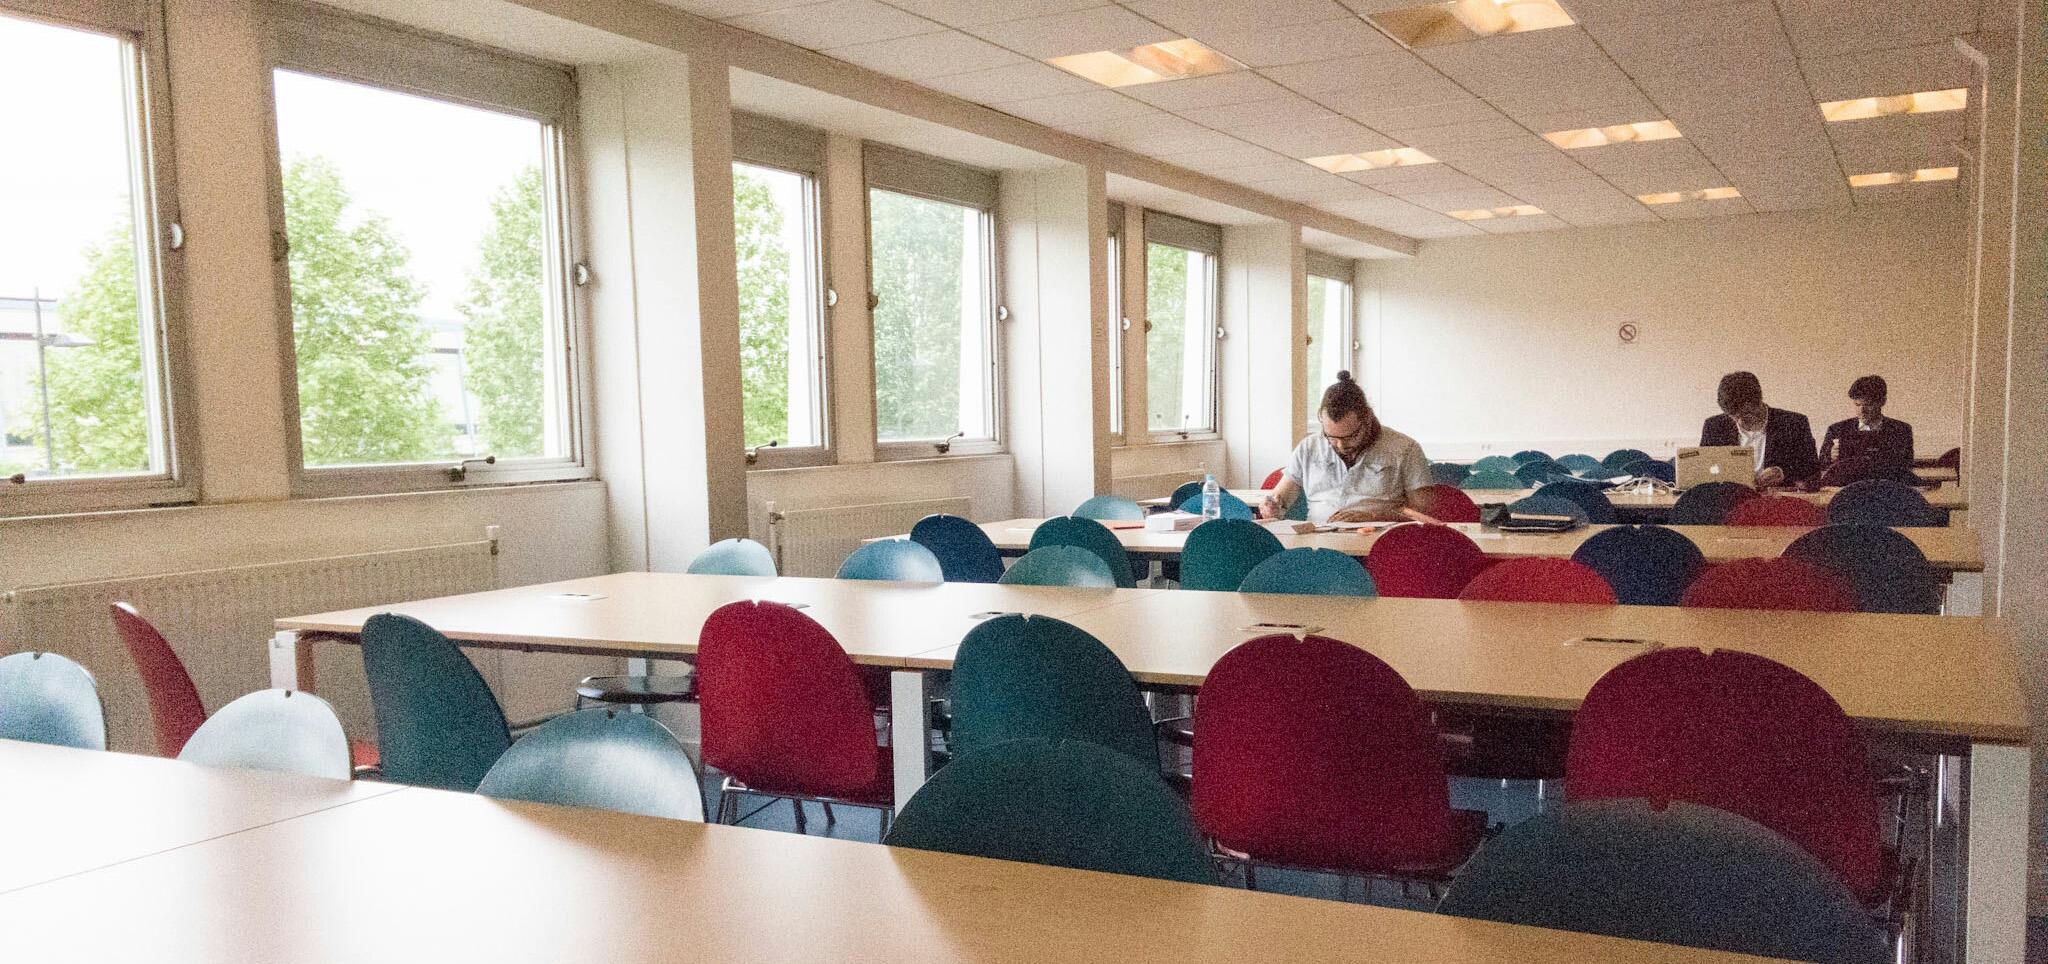 Salle de lecture BUFR DSP